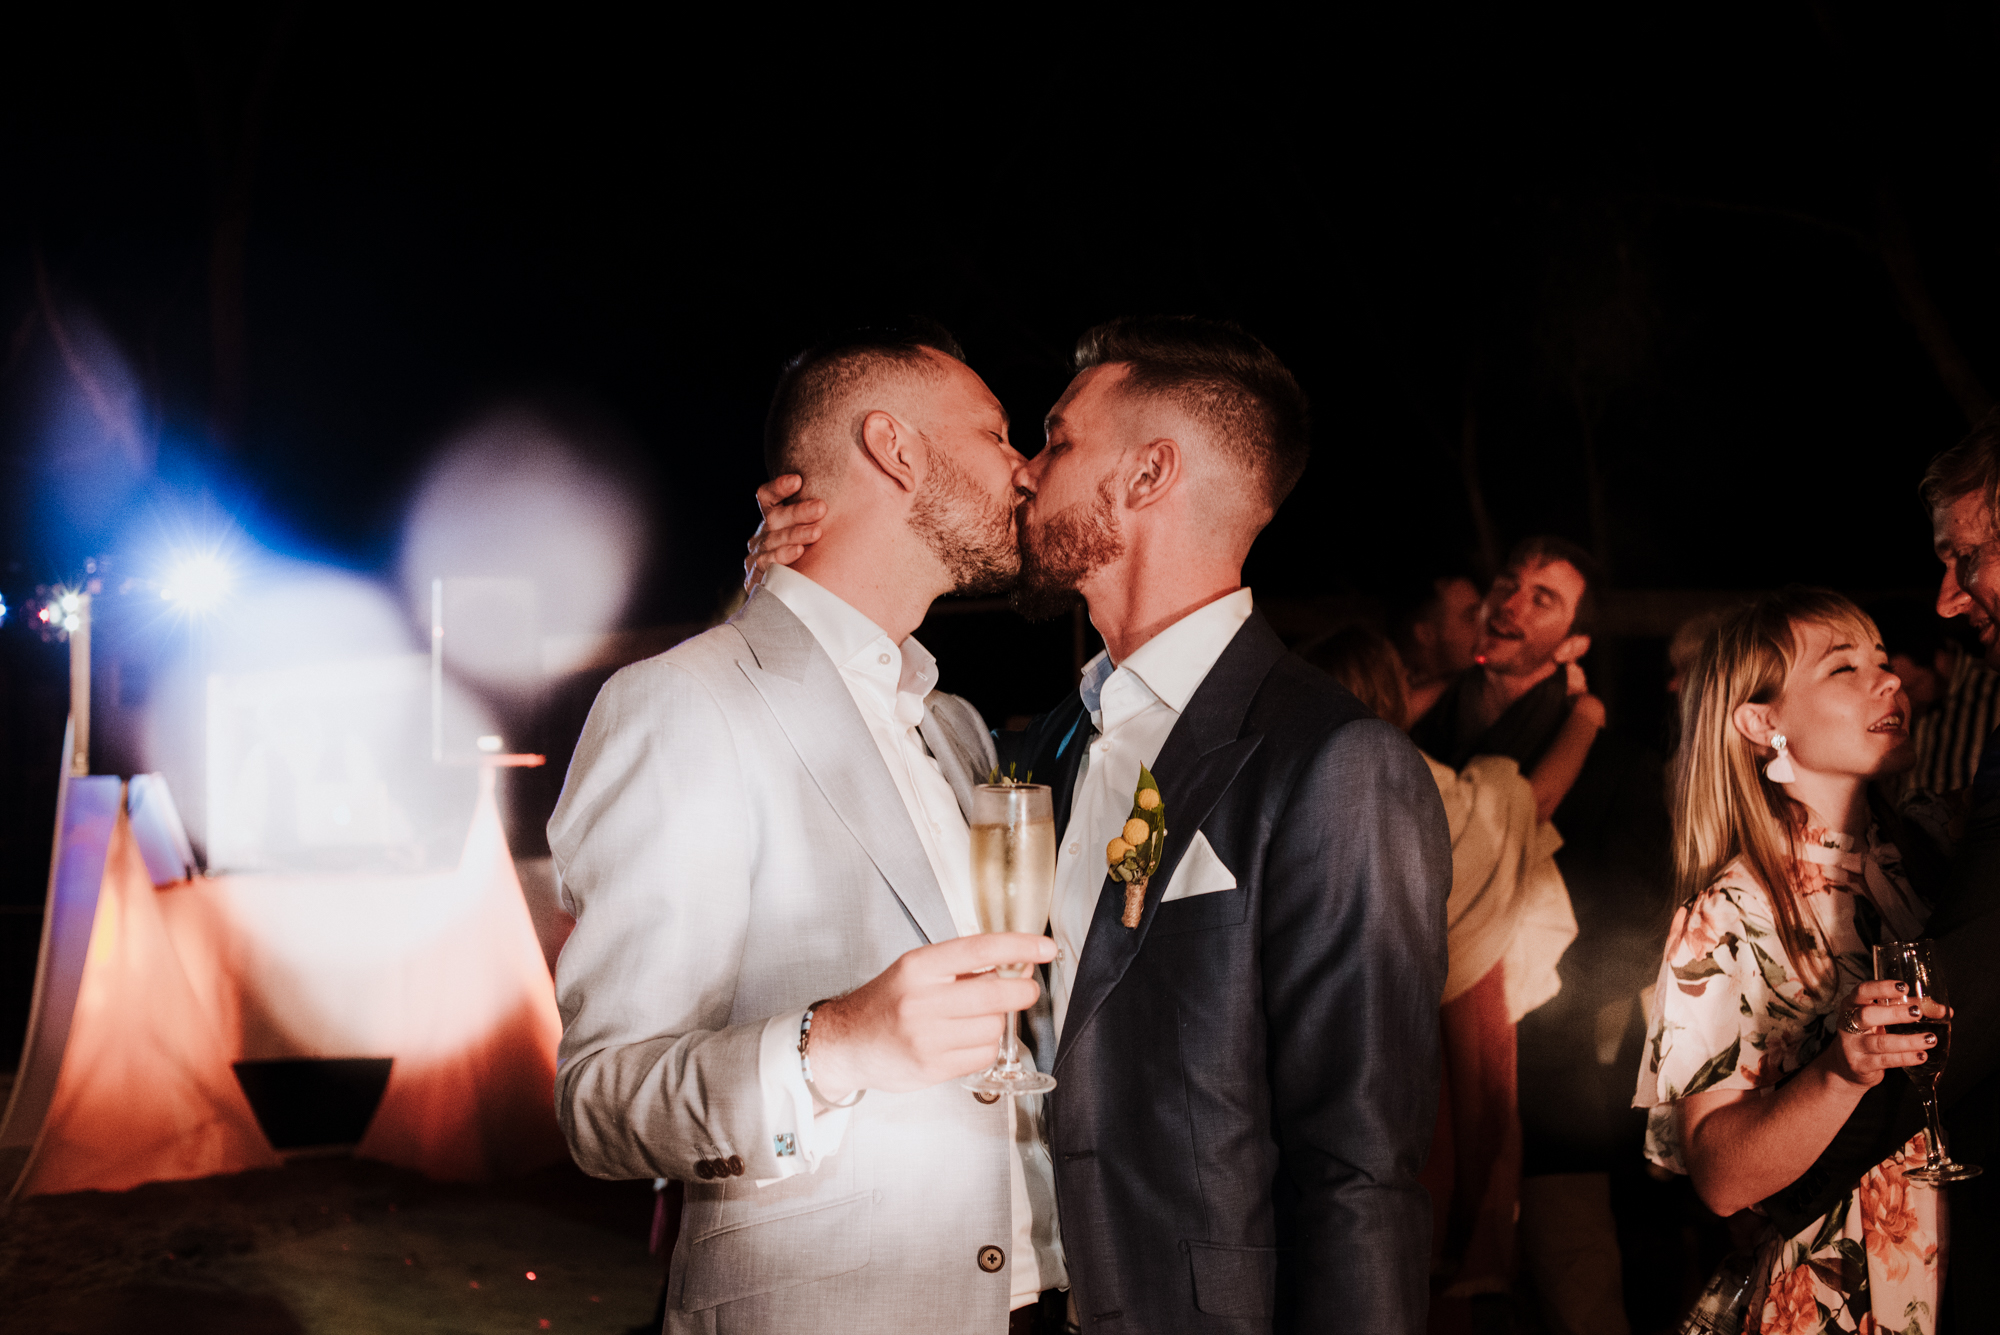 jessica-howard-photography-sean-alessandro-wedding-day-web-547.jpg